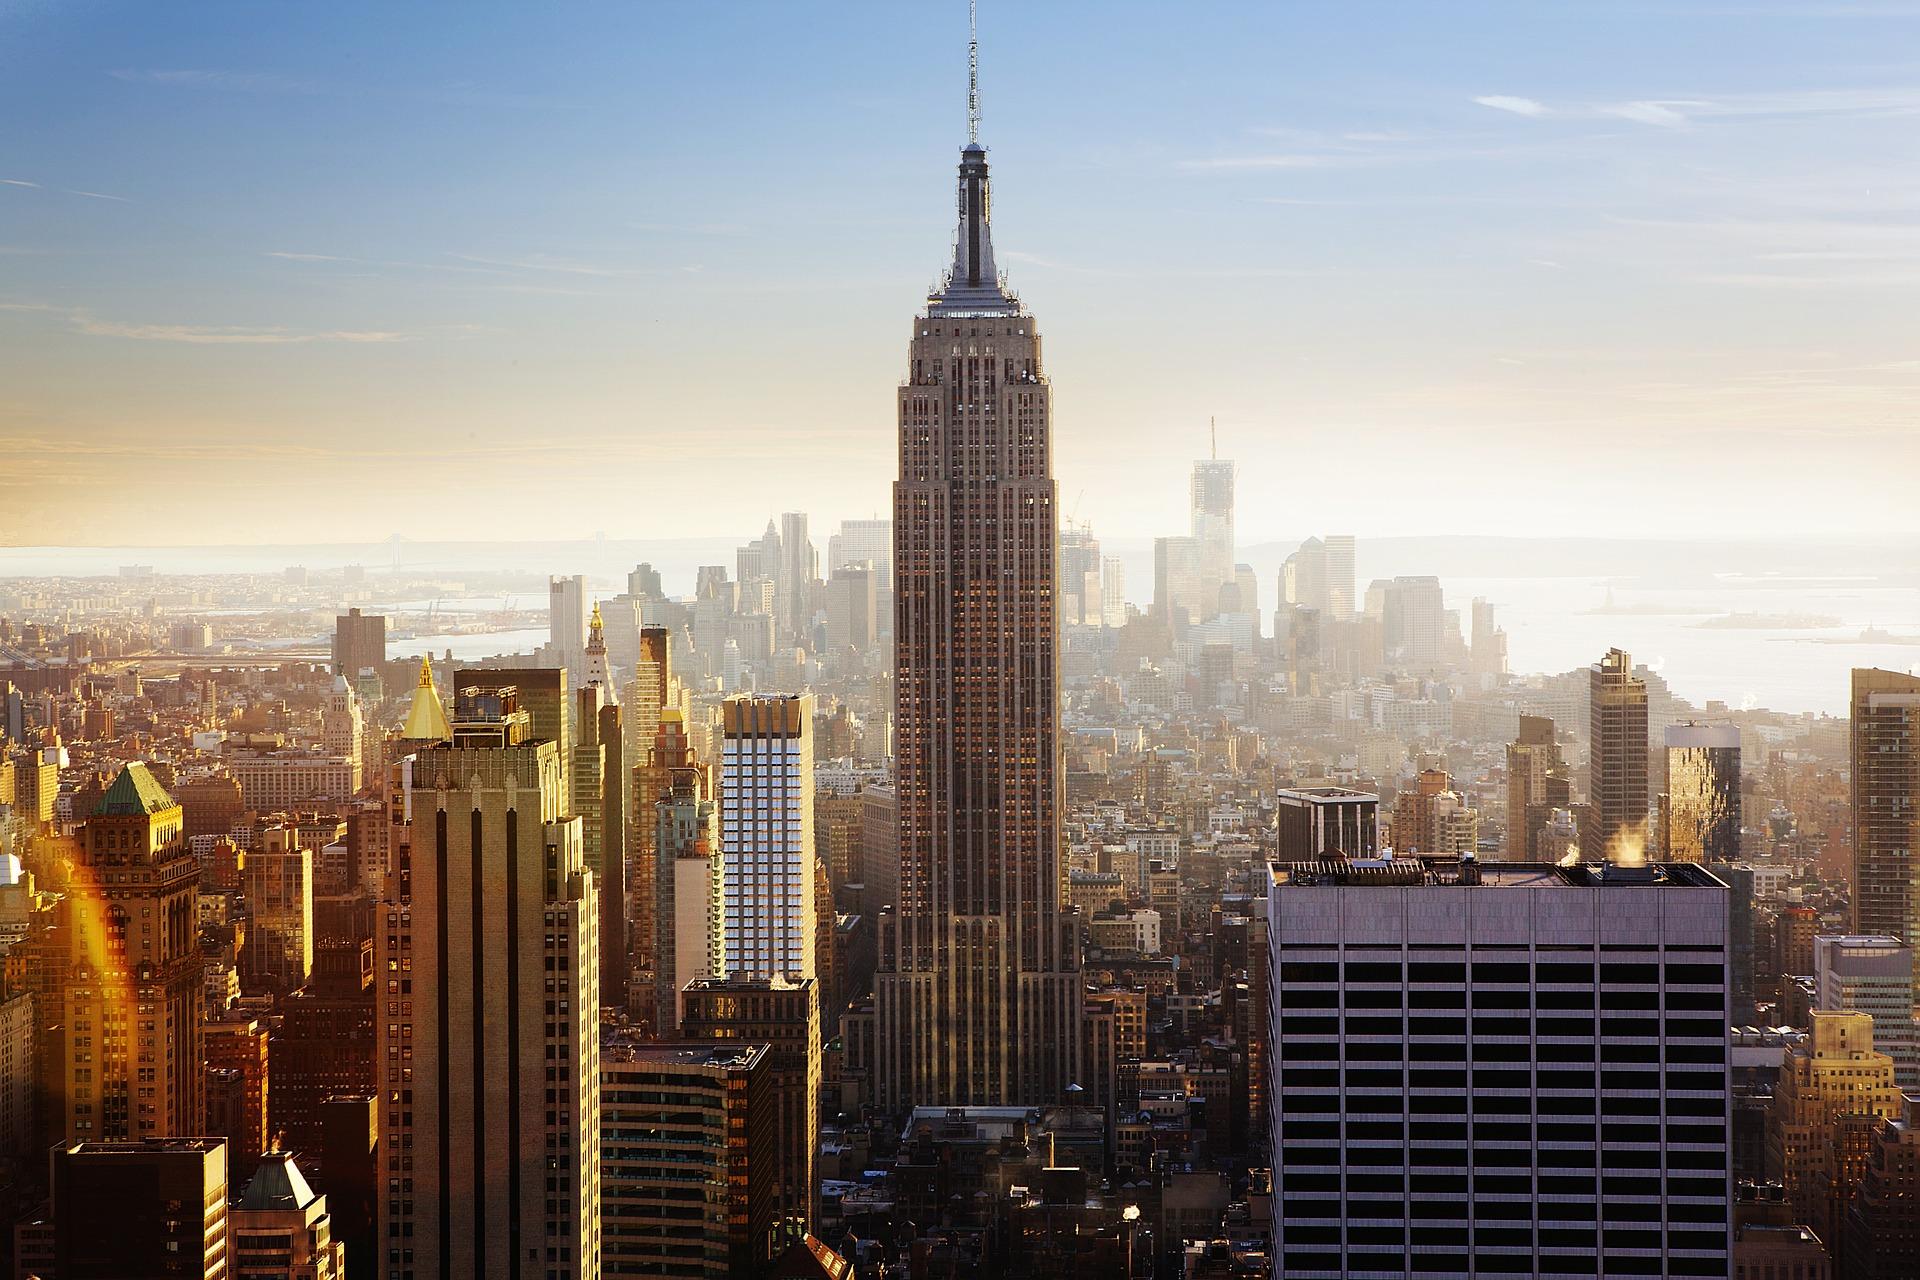 New York seværdighed - empire state building